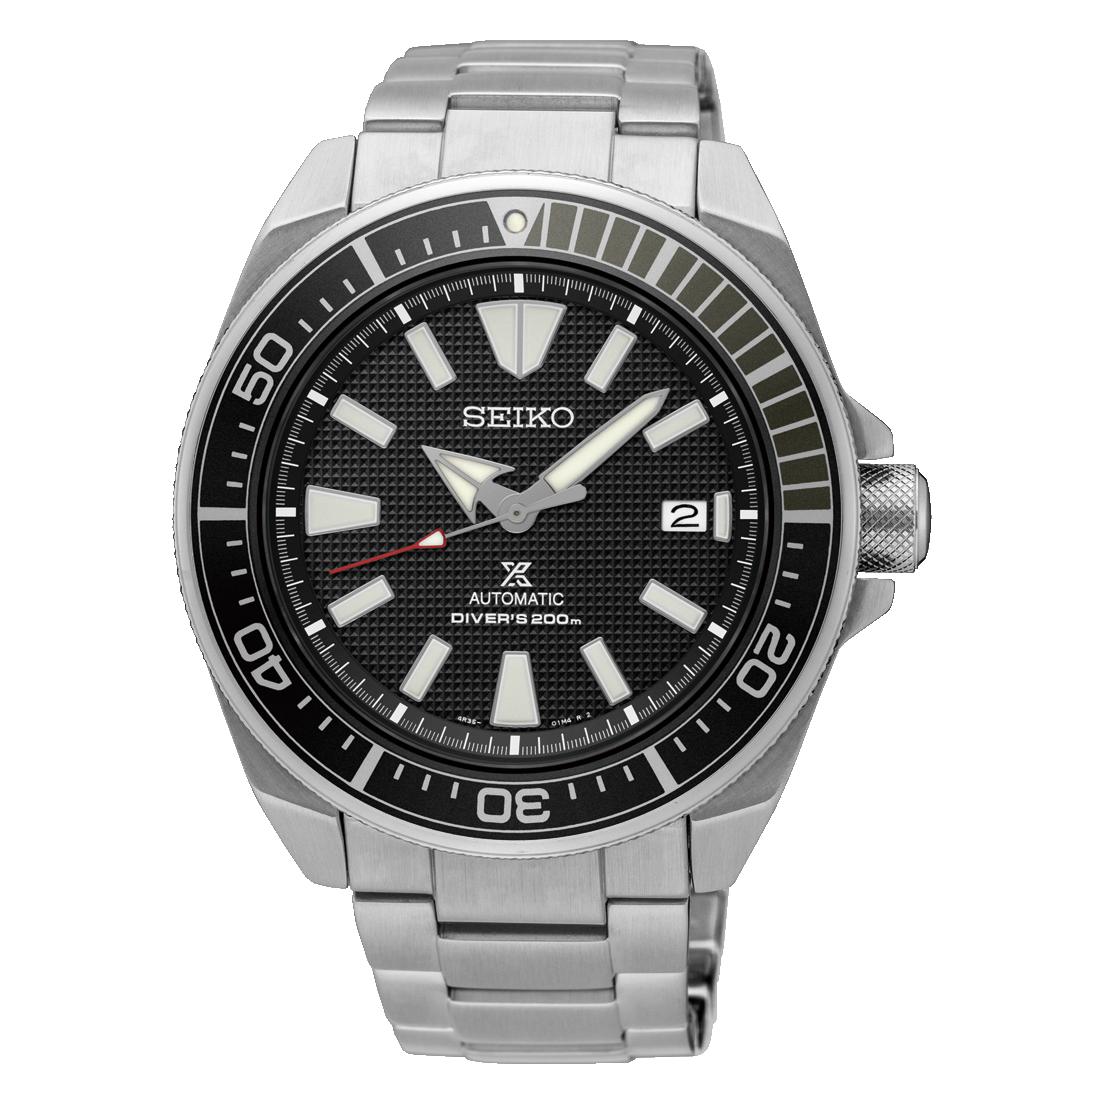 Reloj Automático hombre Seiko Samurai Prospex SRPB51K1 dial negro 44mm correa acero 200m wr